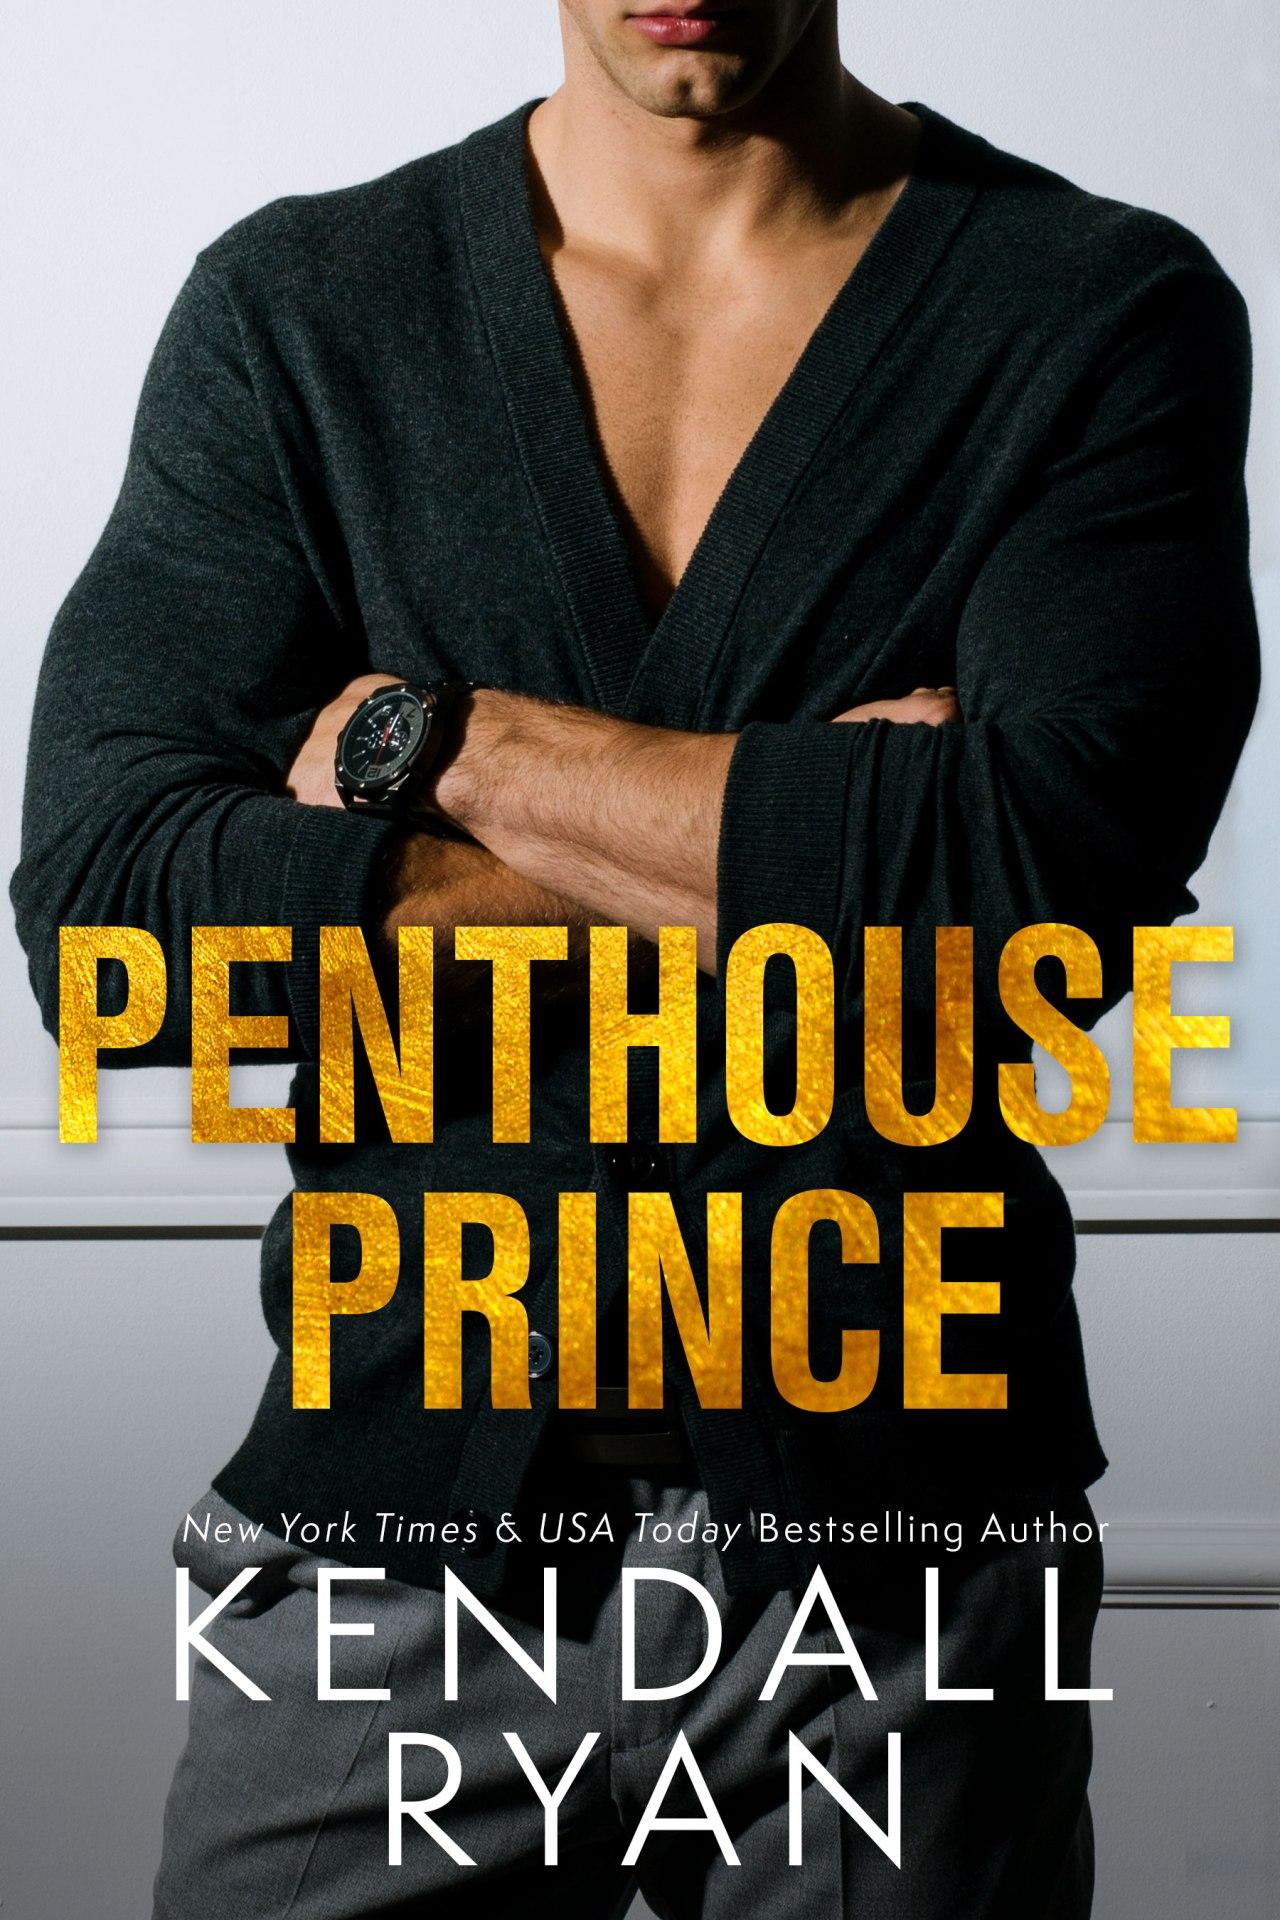 PenthousePrince-6x9ebook